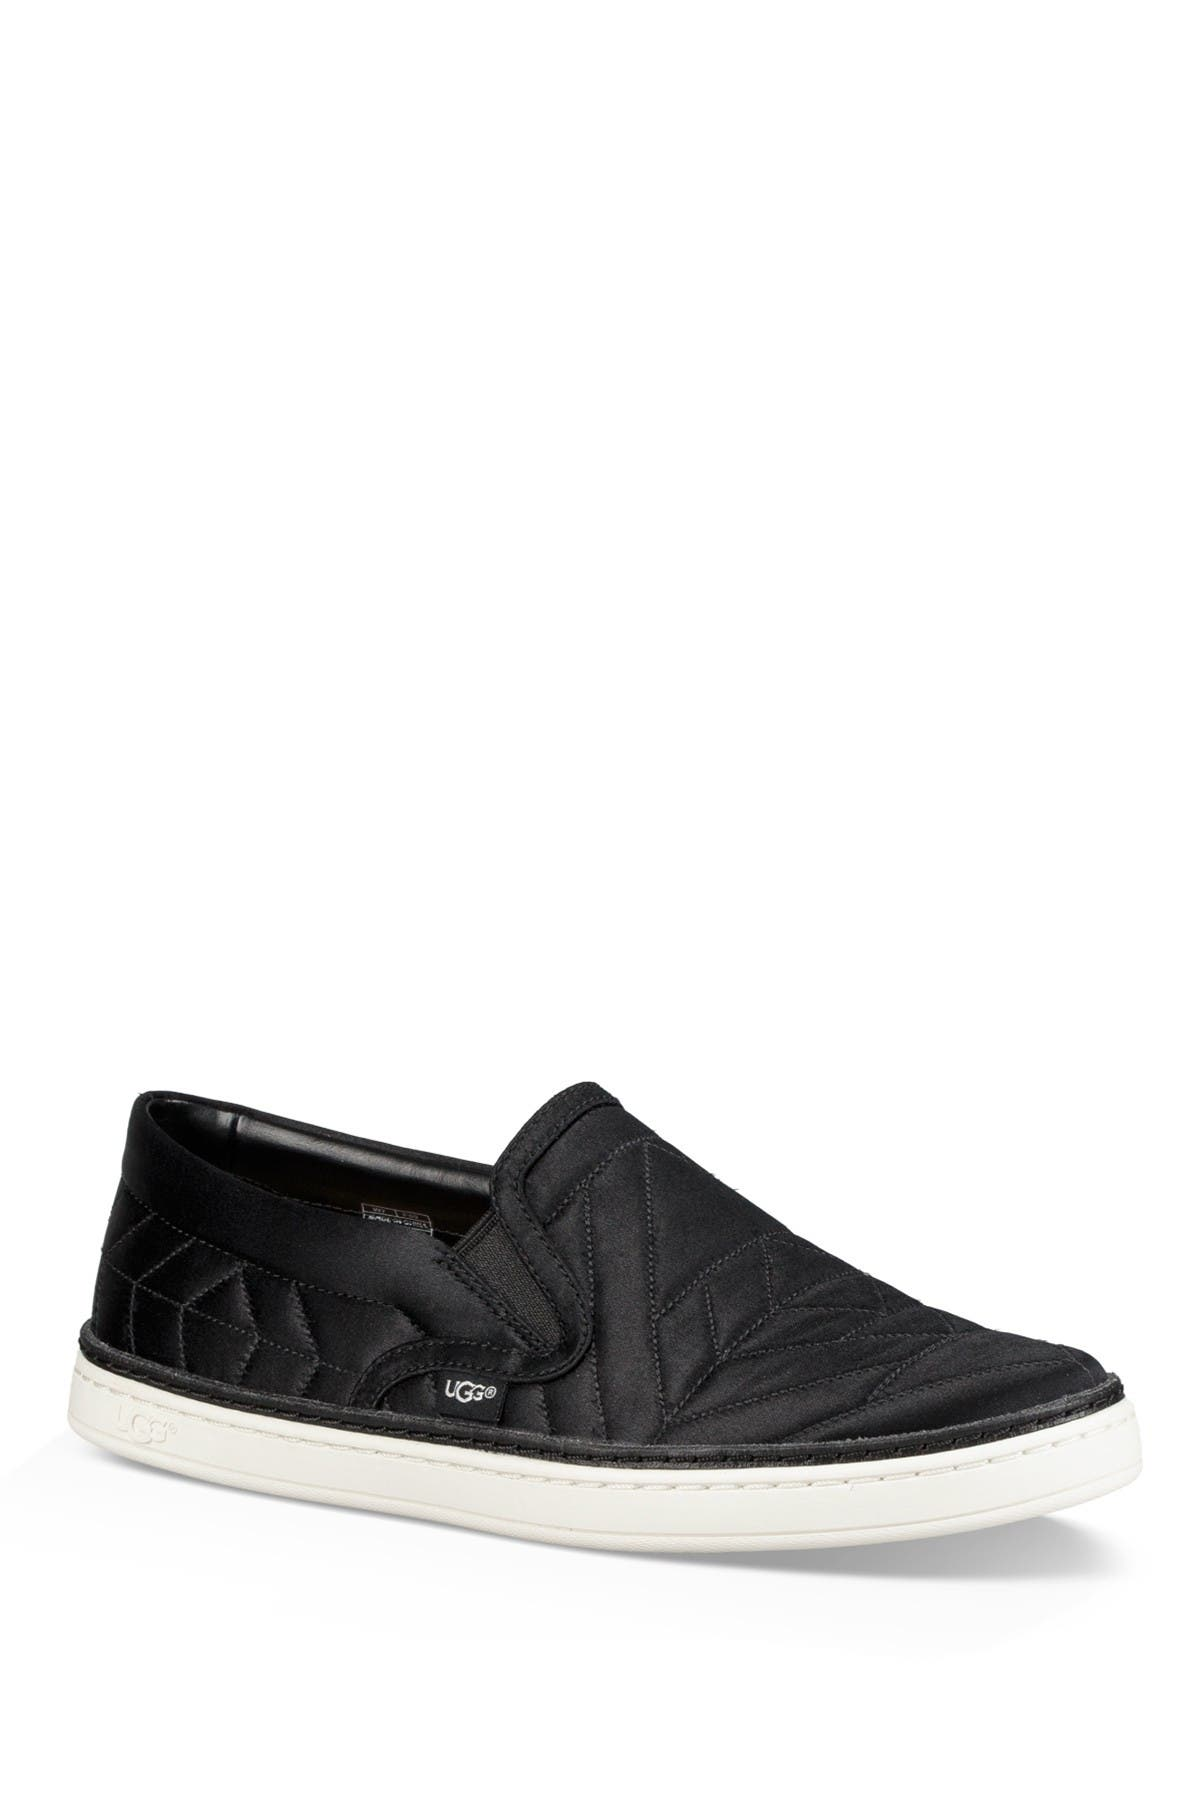 UGG | Soleda Quilted Sneaker